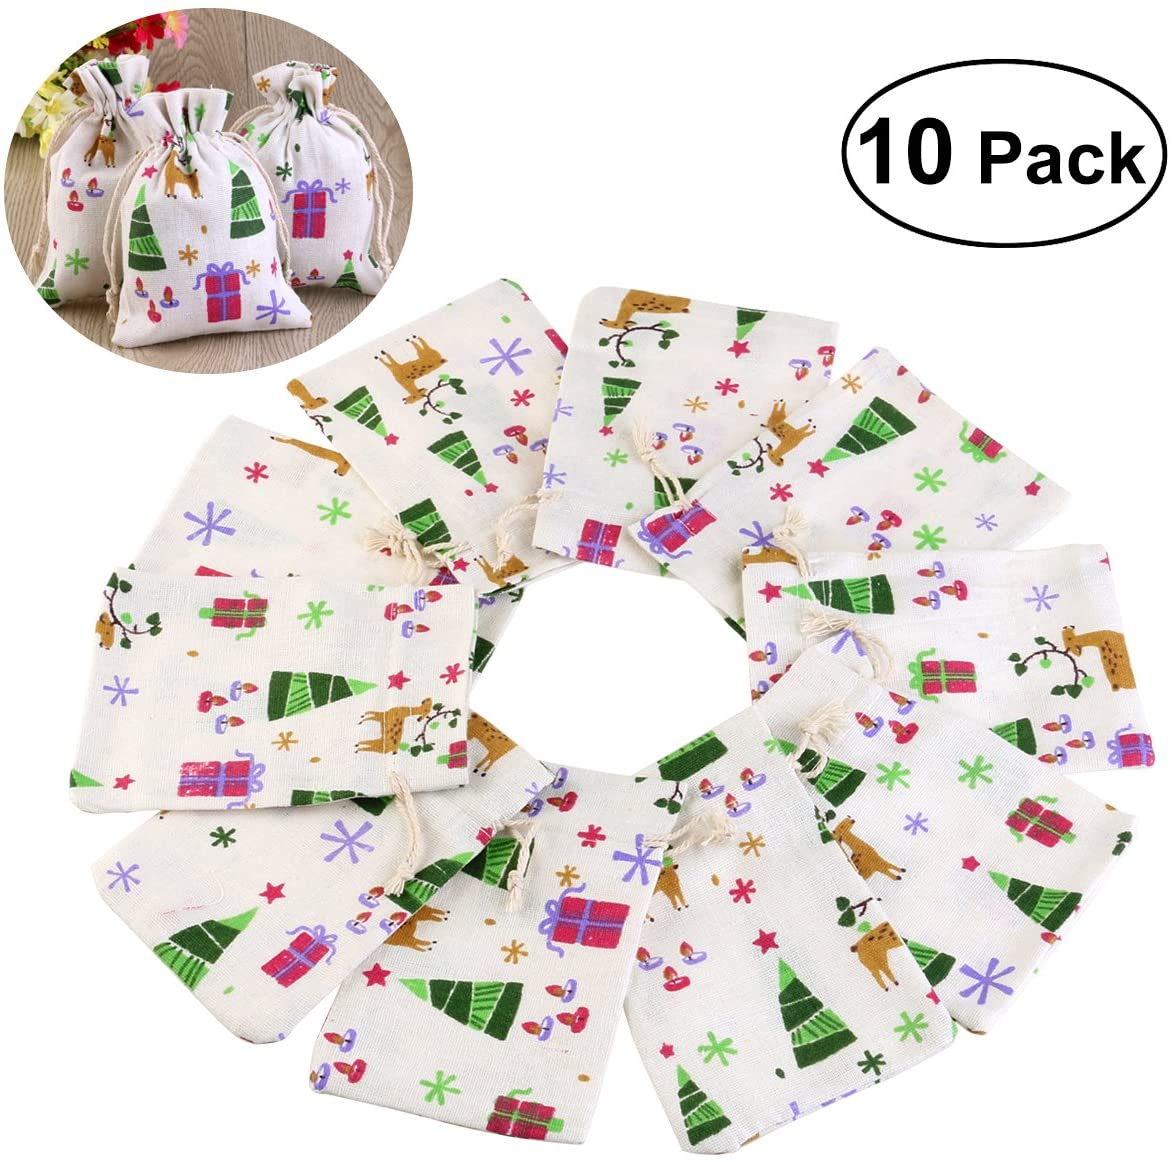 UEETEK Natural Linen Jute Burlap Small Simple Sack Pouch Drawstring Bag Jewery Bag Wedding Favor-Pack 10pcs